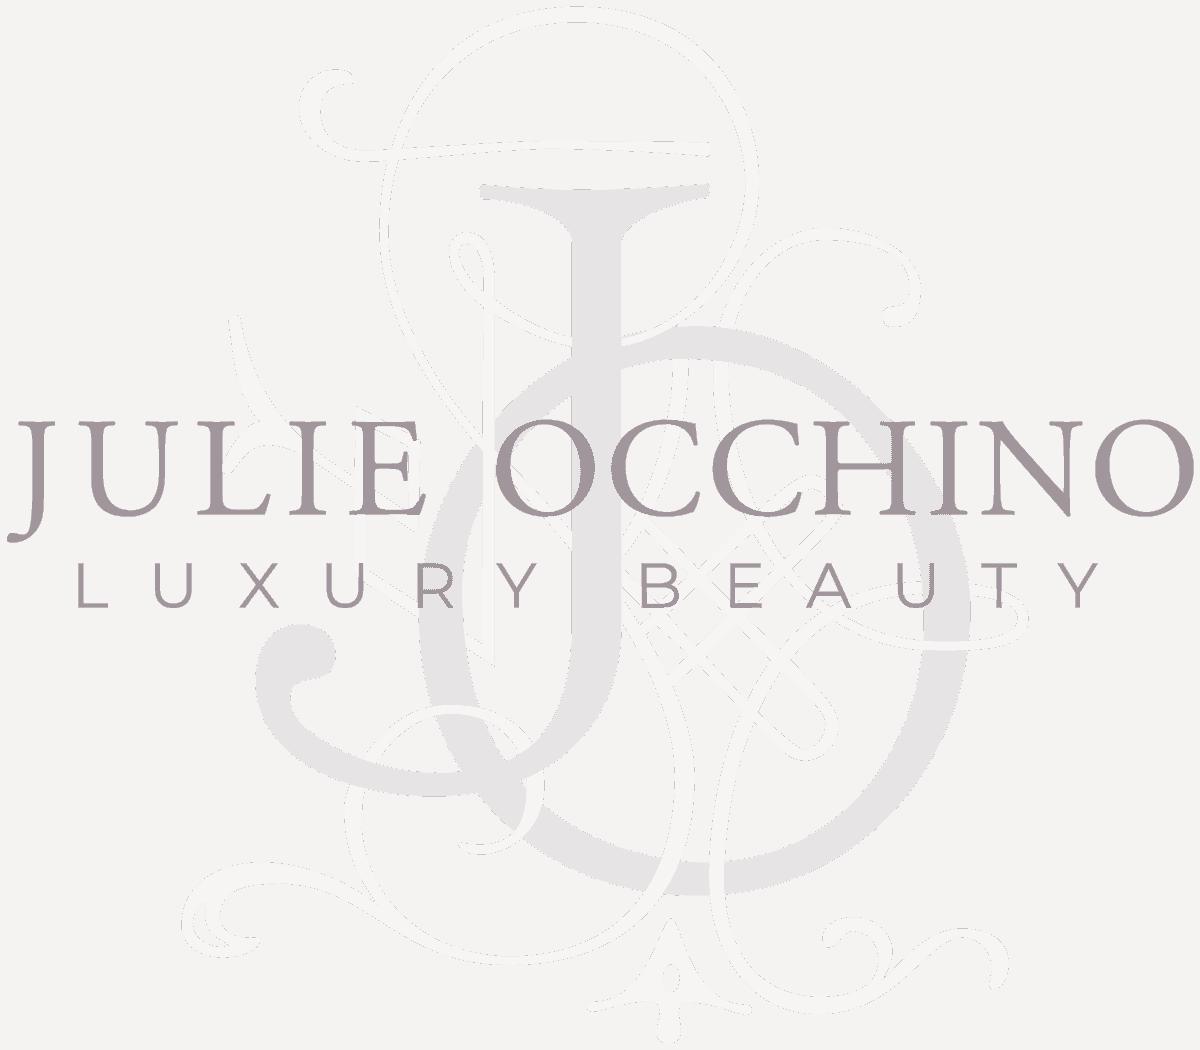 Julie Occhino Luxury Beauty Wedding makeup couture hairstylist New York Worldwide destinations international beauty services premier